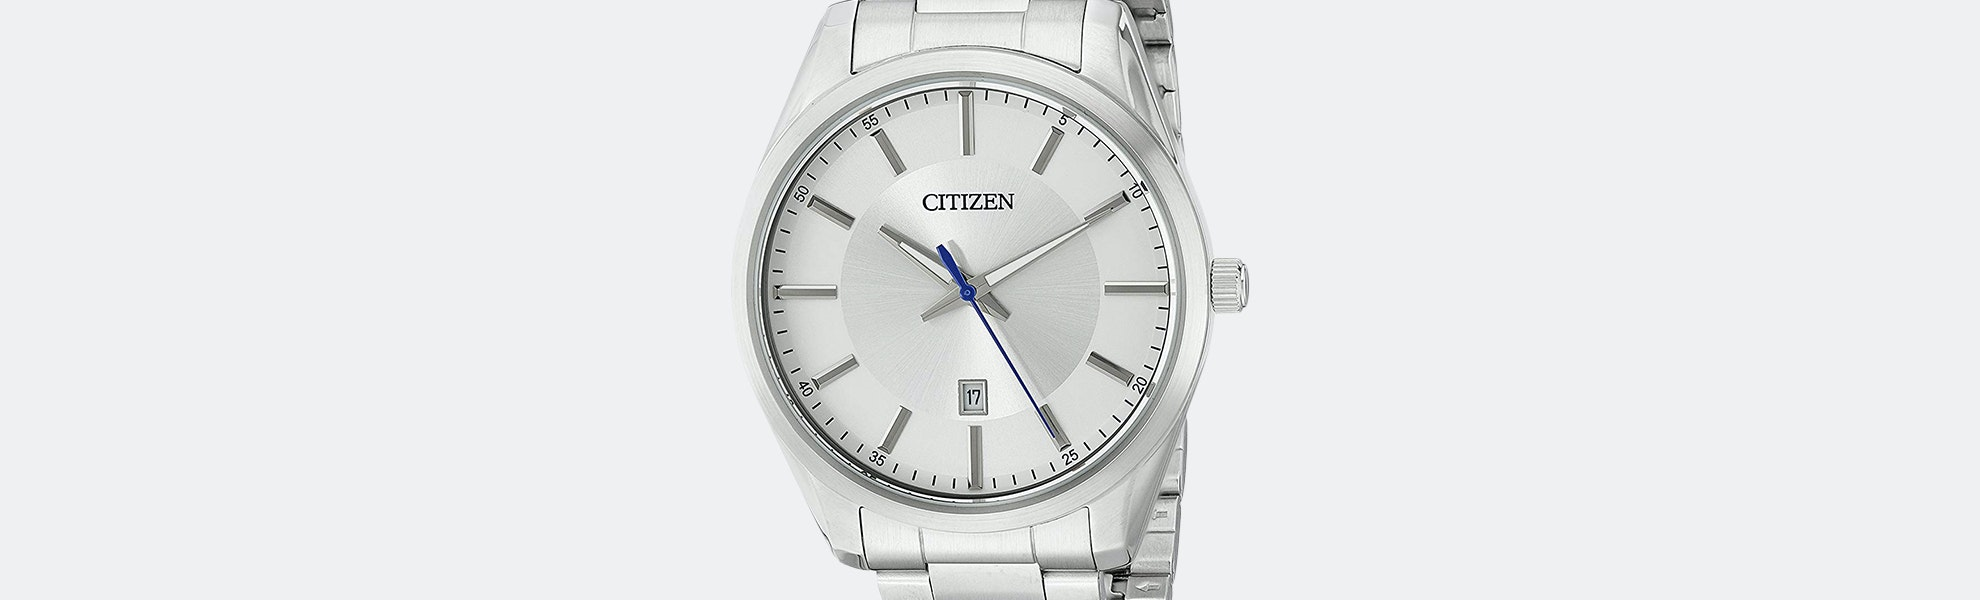 Citizen BI1030 Quartz Watch